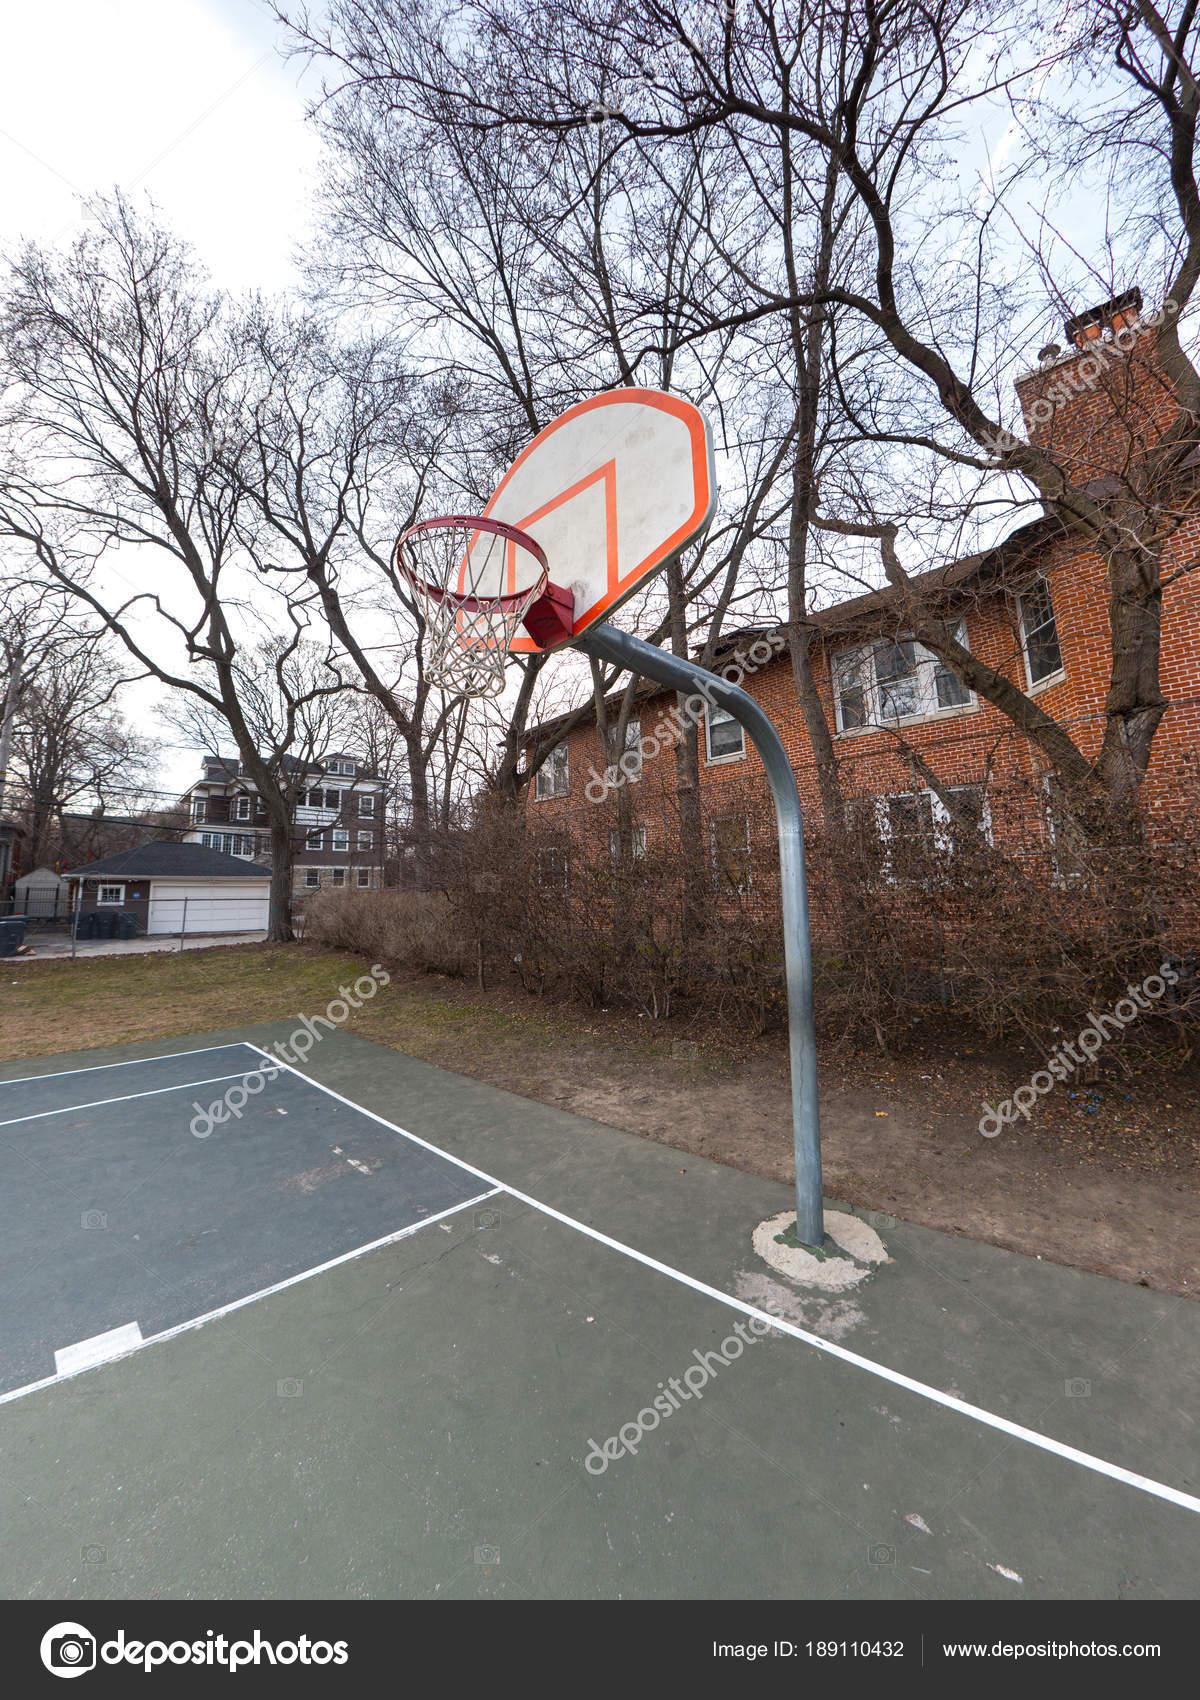 Photograph Urban Outdoor Basketball Court White Orange Backboard Rim Net U2014  Stock Photo